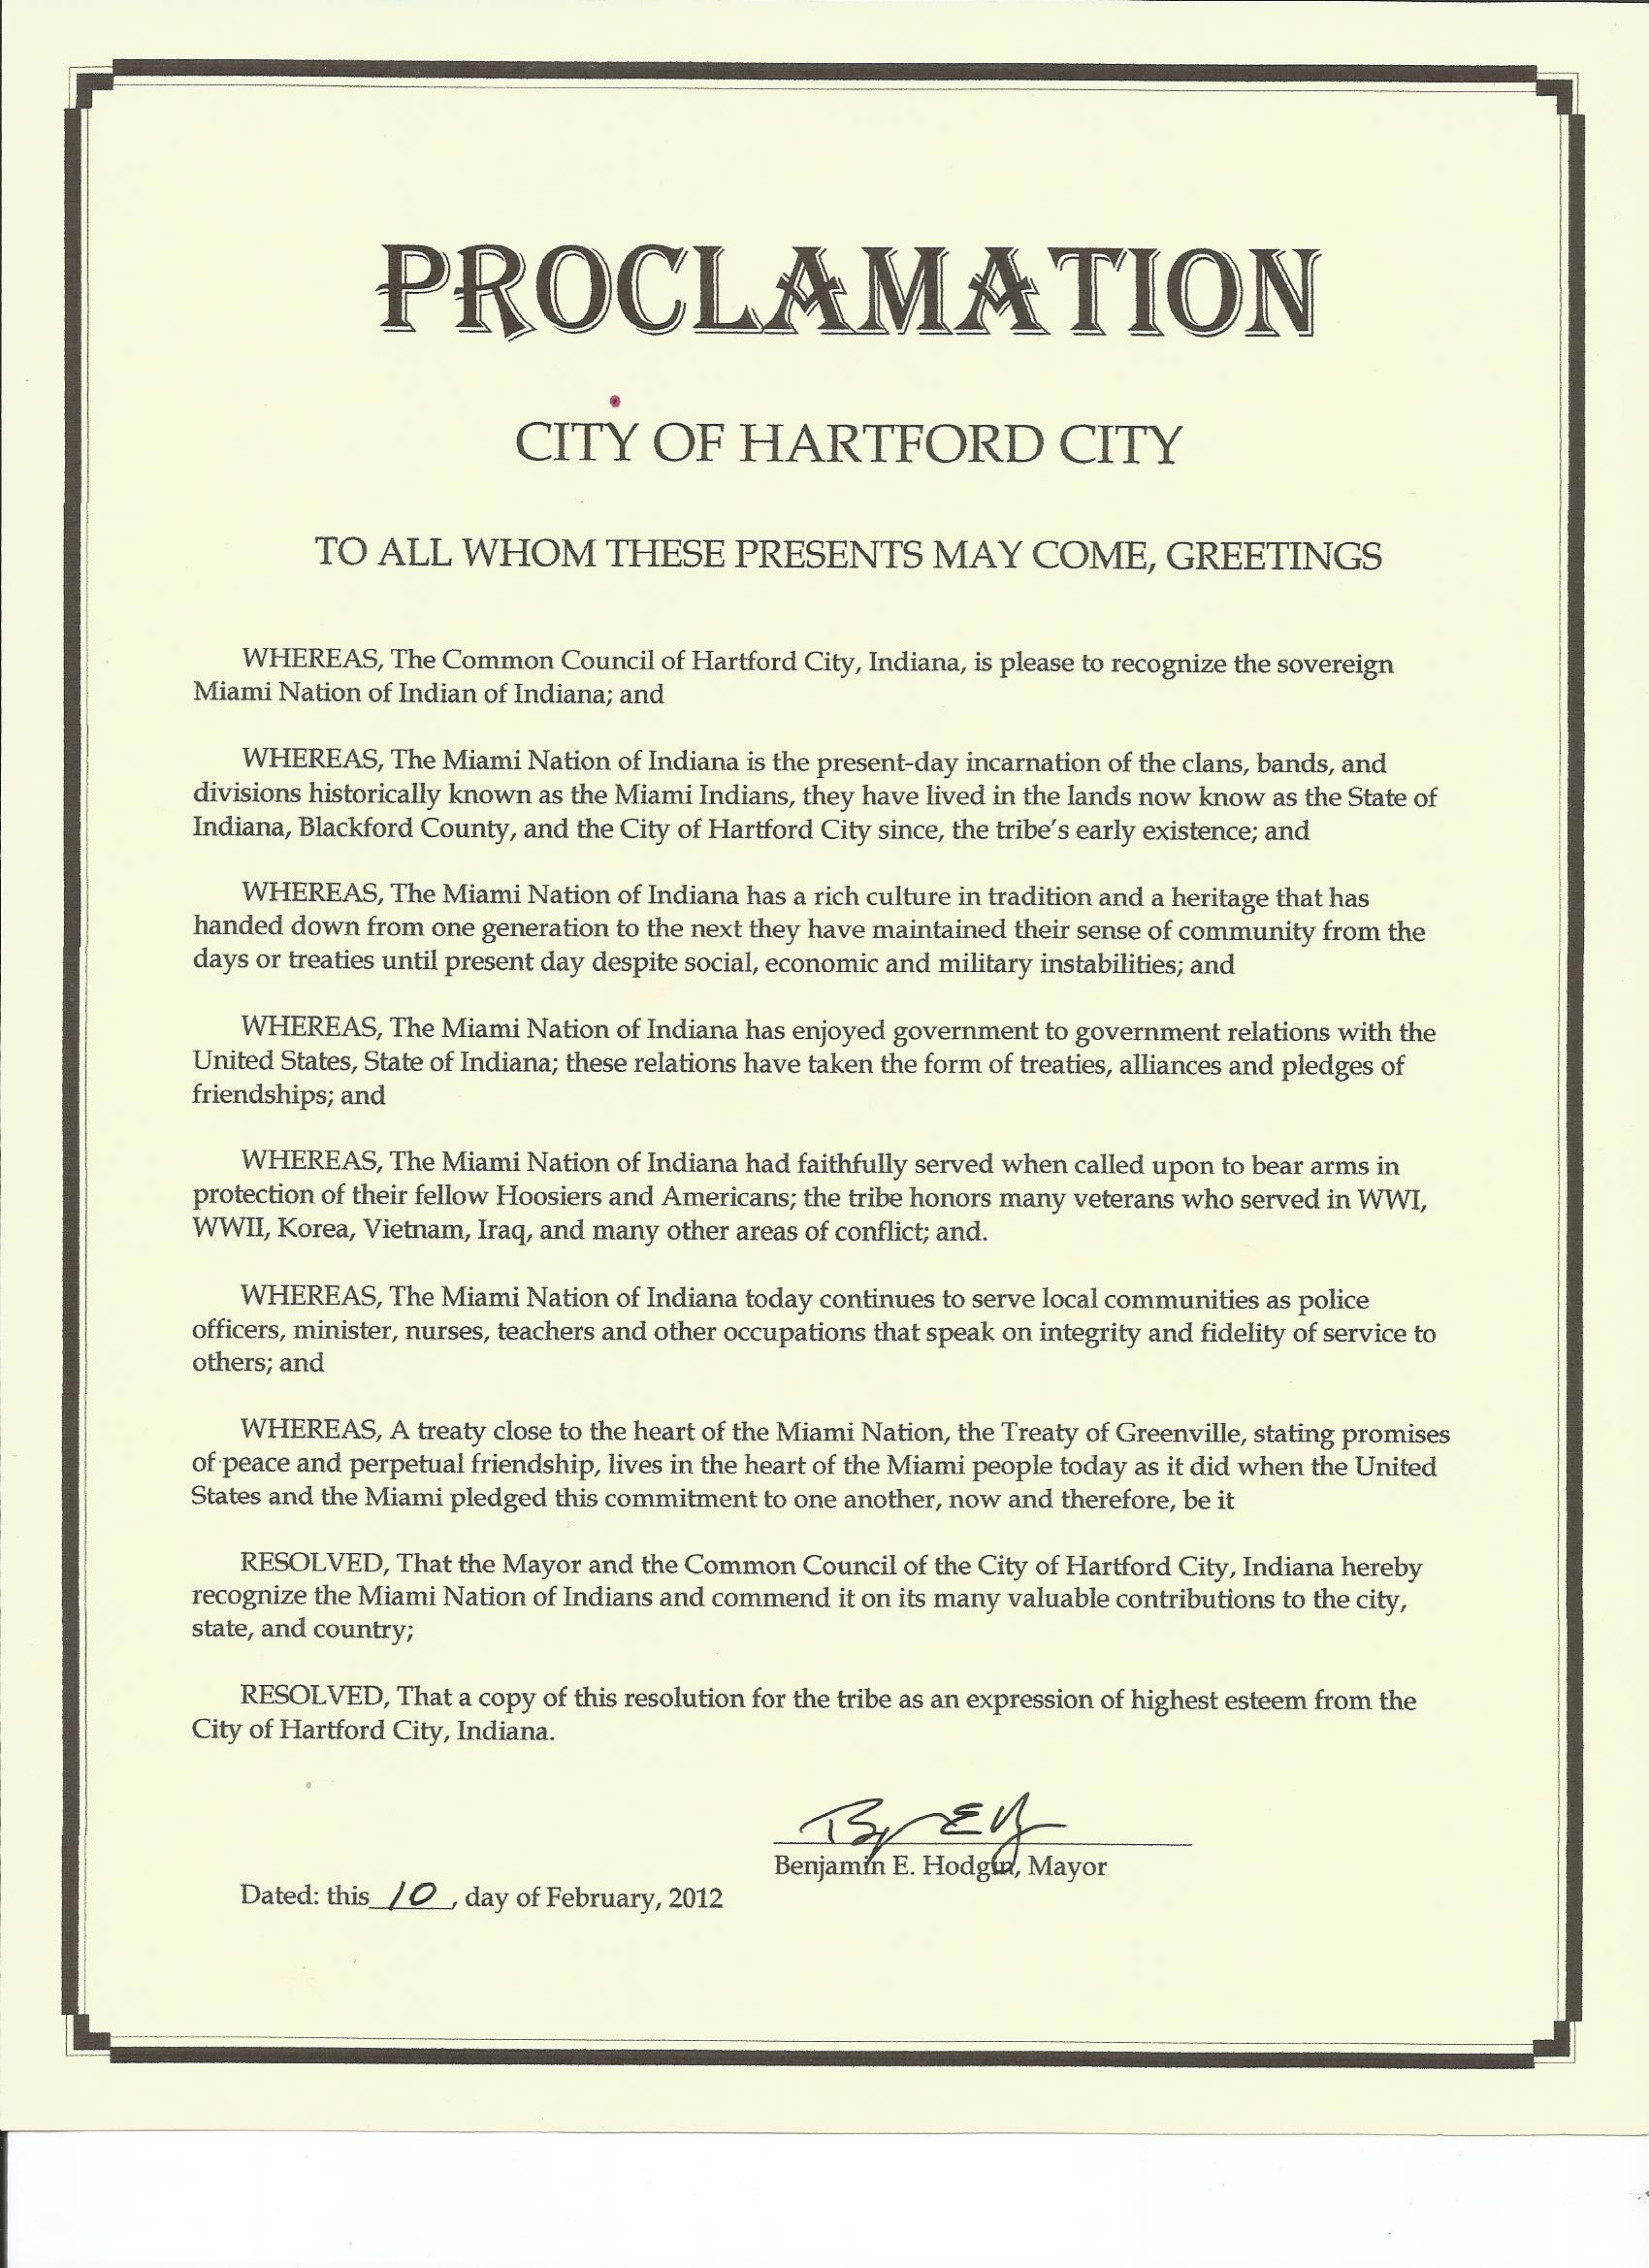 Proclamation City of Hartford City.jpg